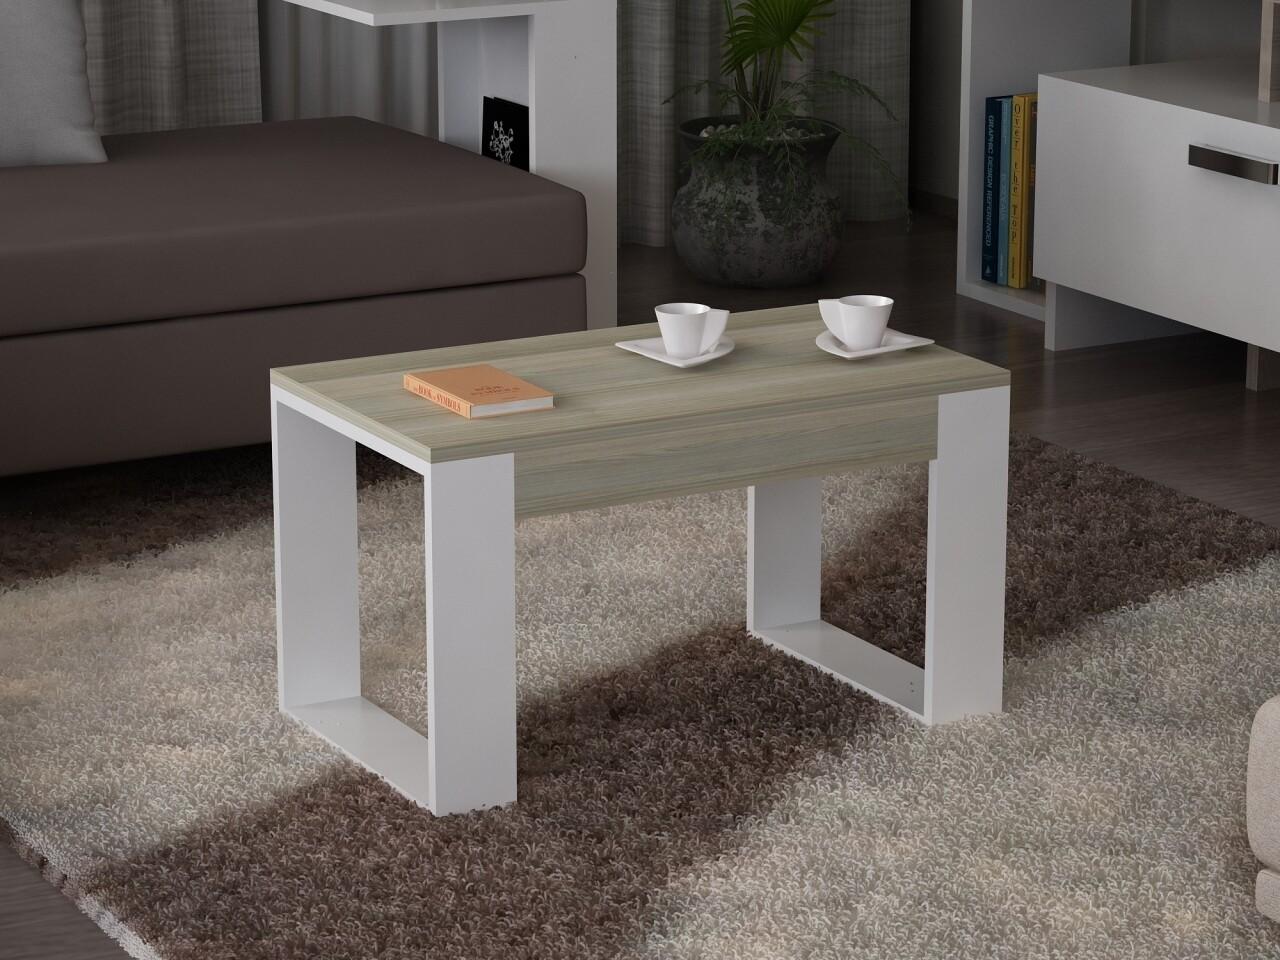 Masuta pentru living, Wooden Art, Arda White, 60x45x45 cm